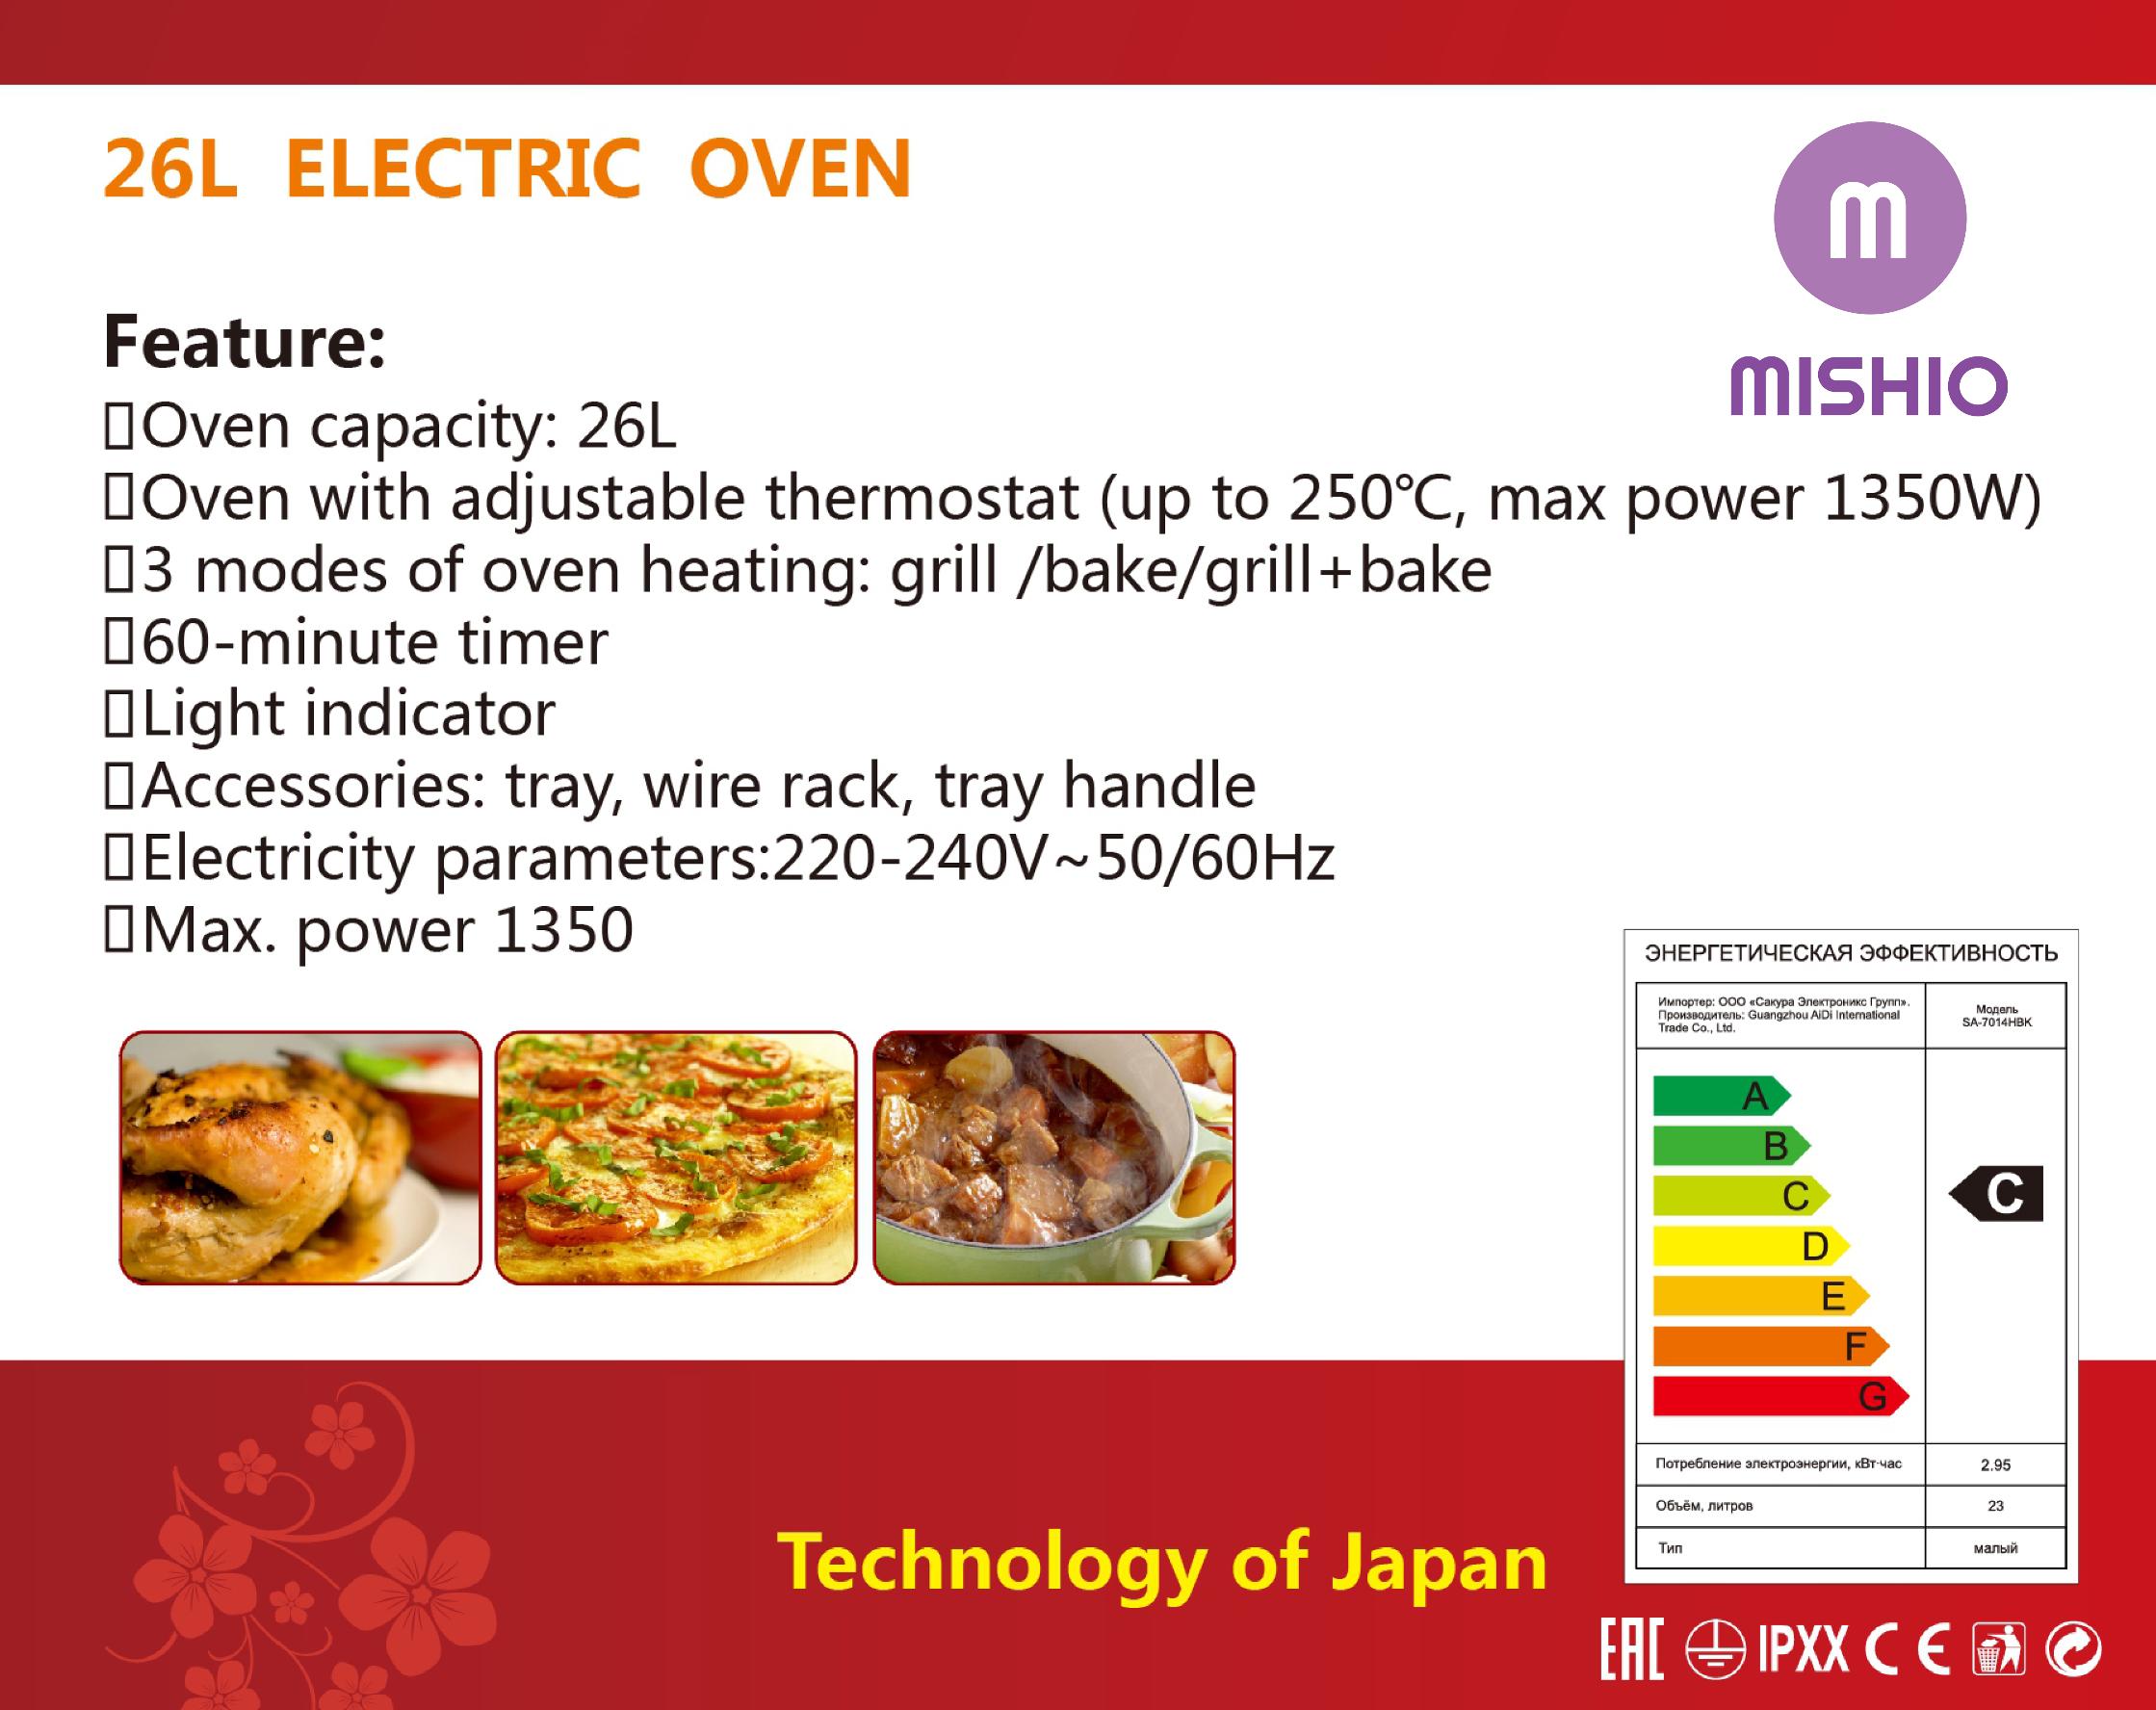 Lò nướng Mishio 26L (Đen) - Tặng máy xay ép